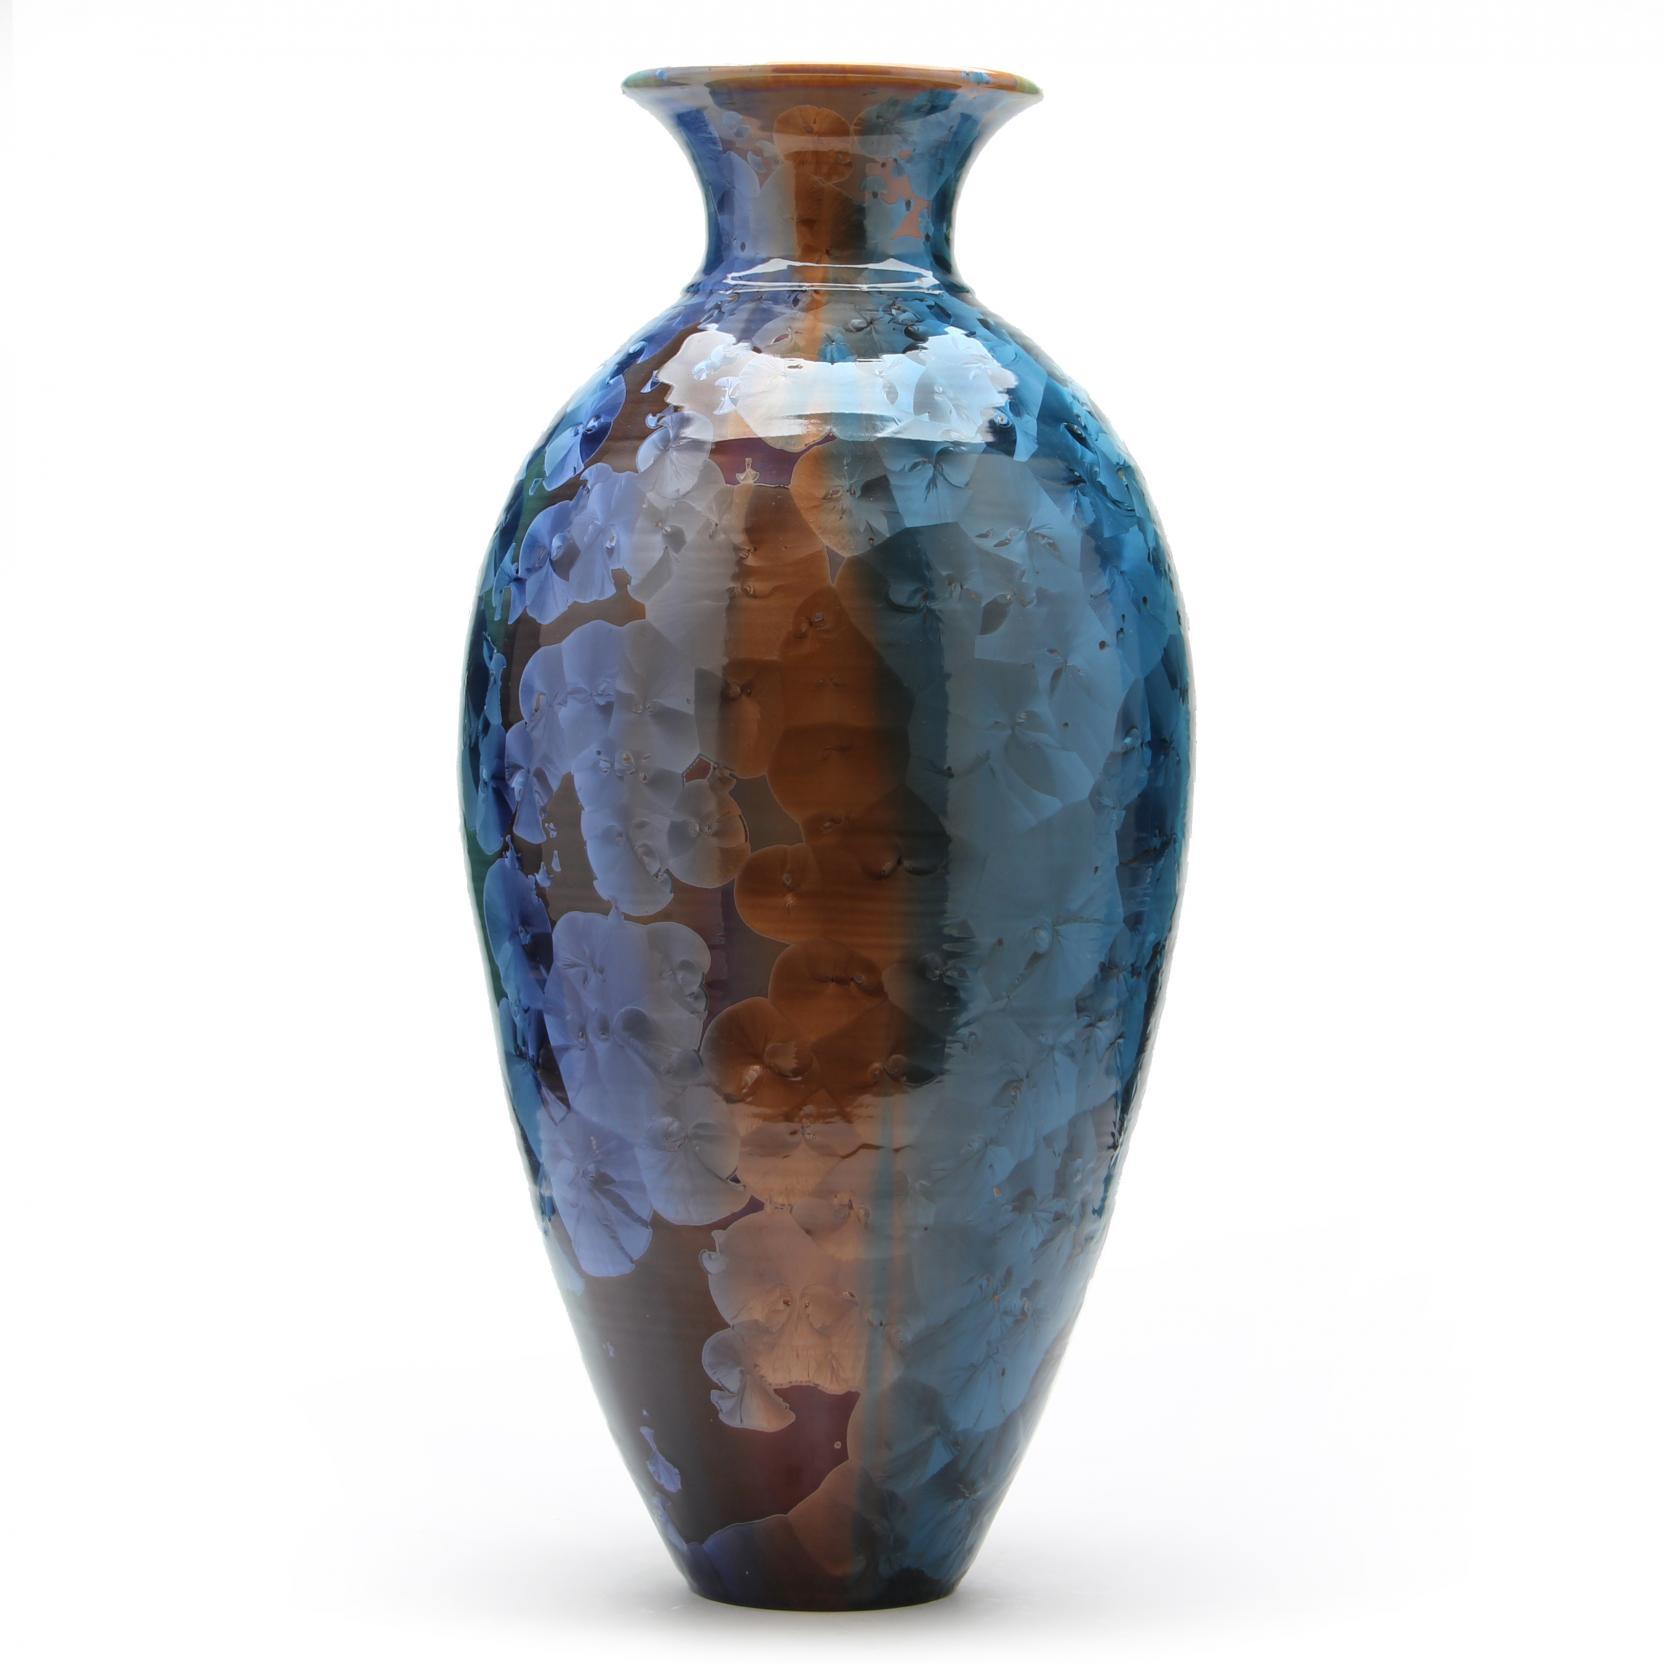 phil-morgan-crystalline-floor-vase